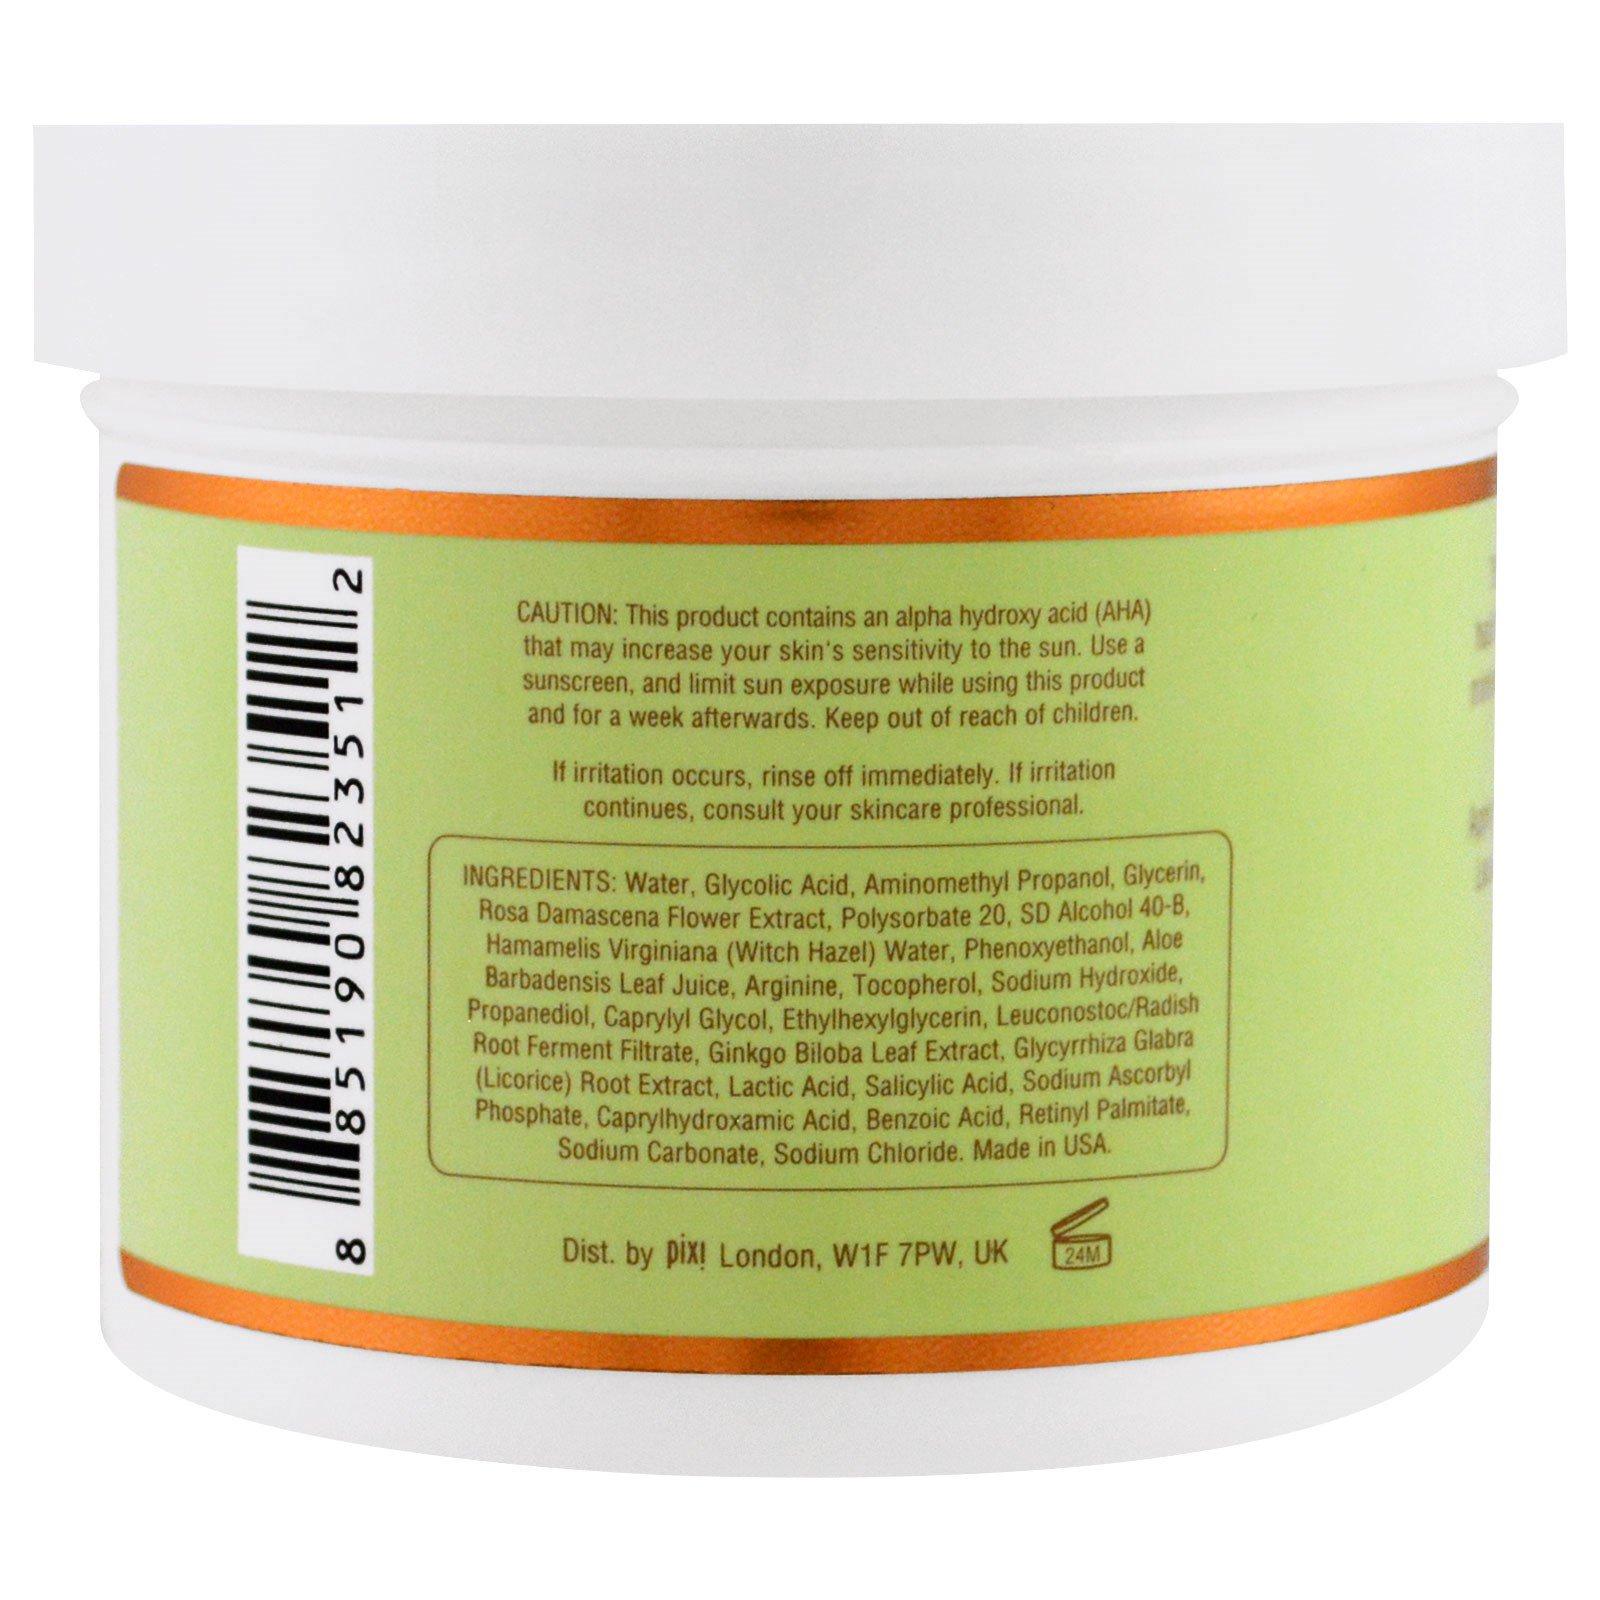 Pixi Beauty Glow Peel Pads Advanced Exfoliating